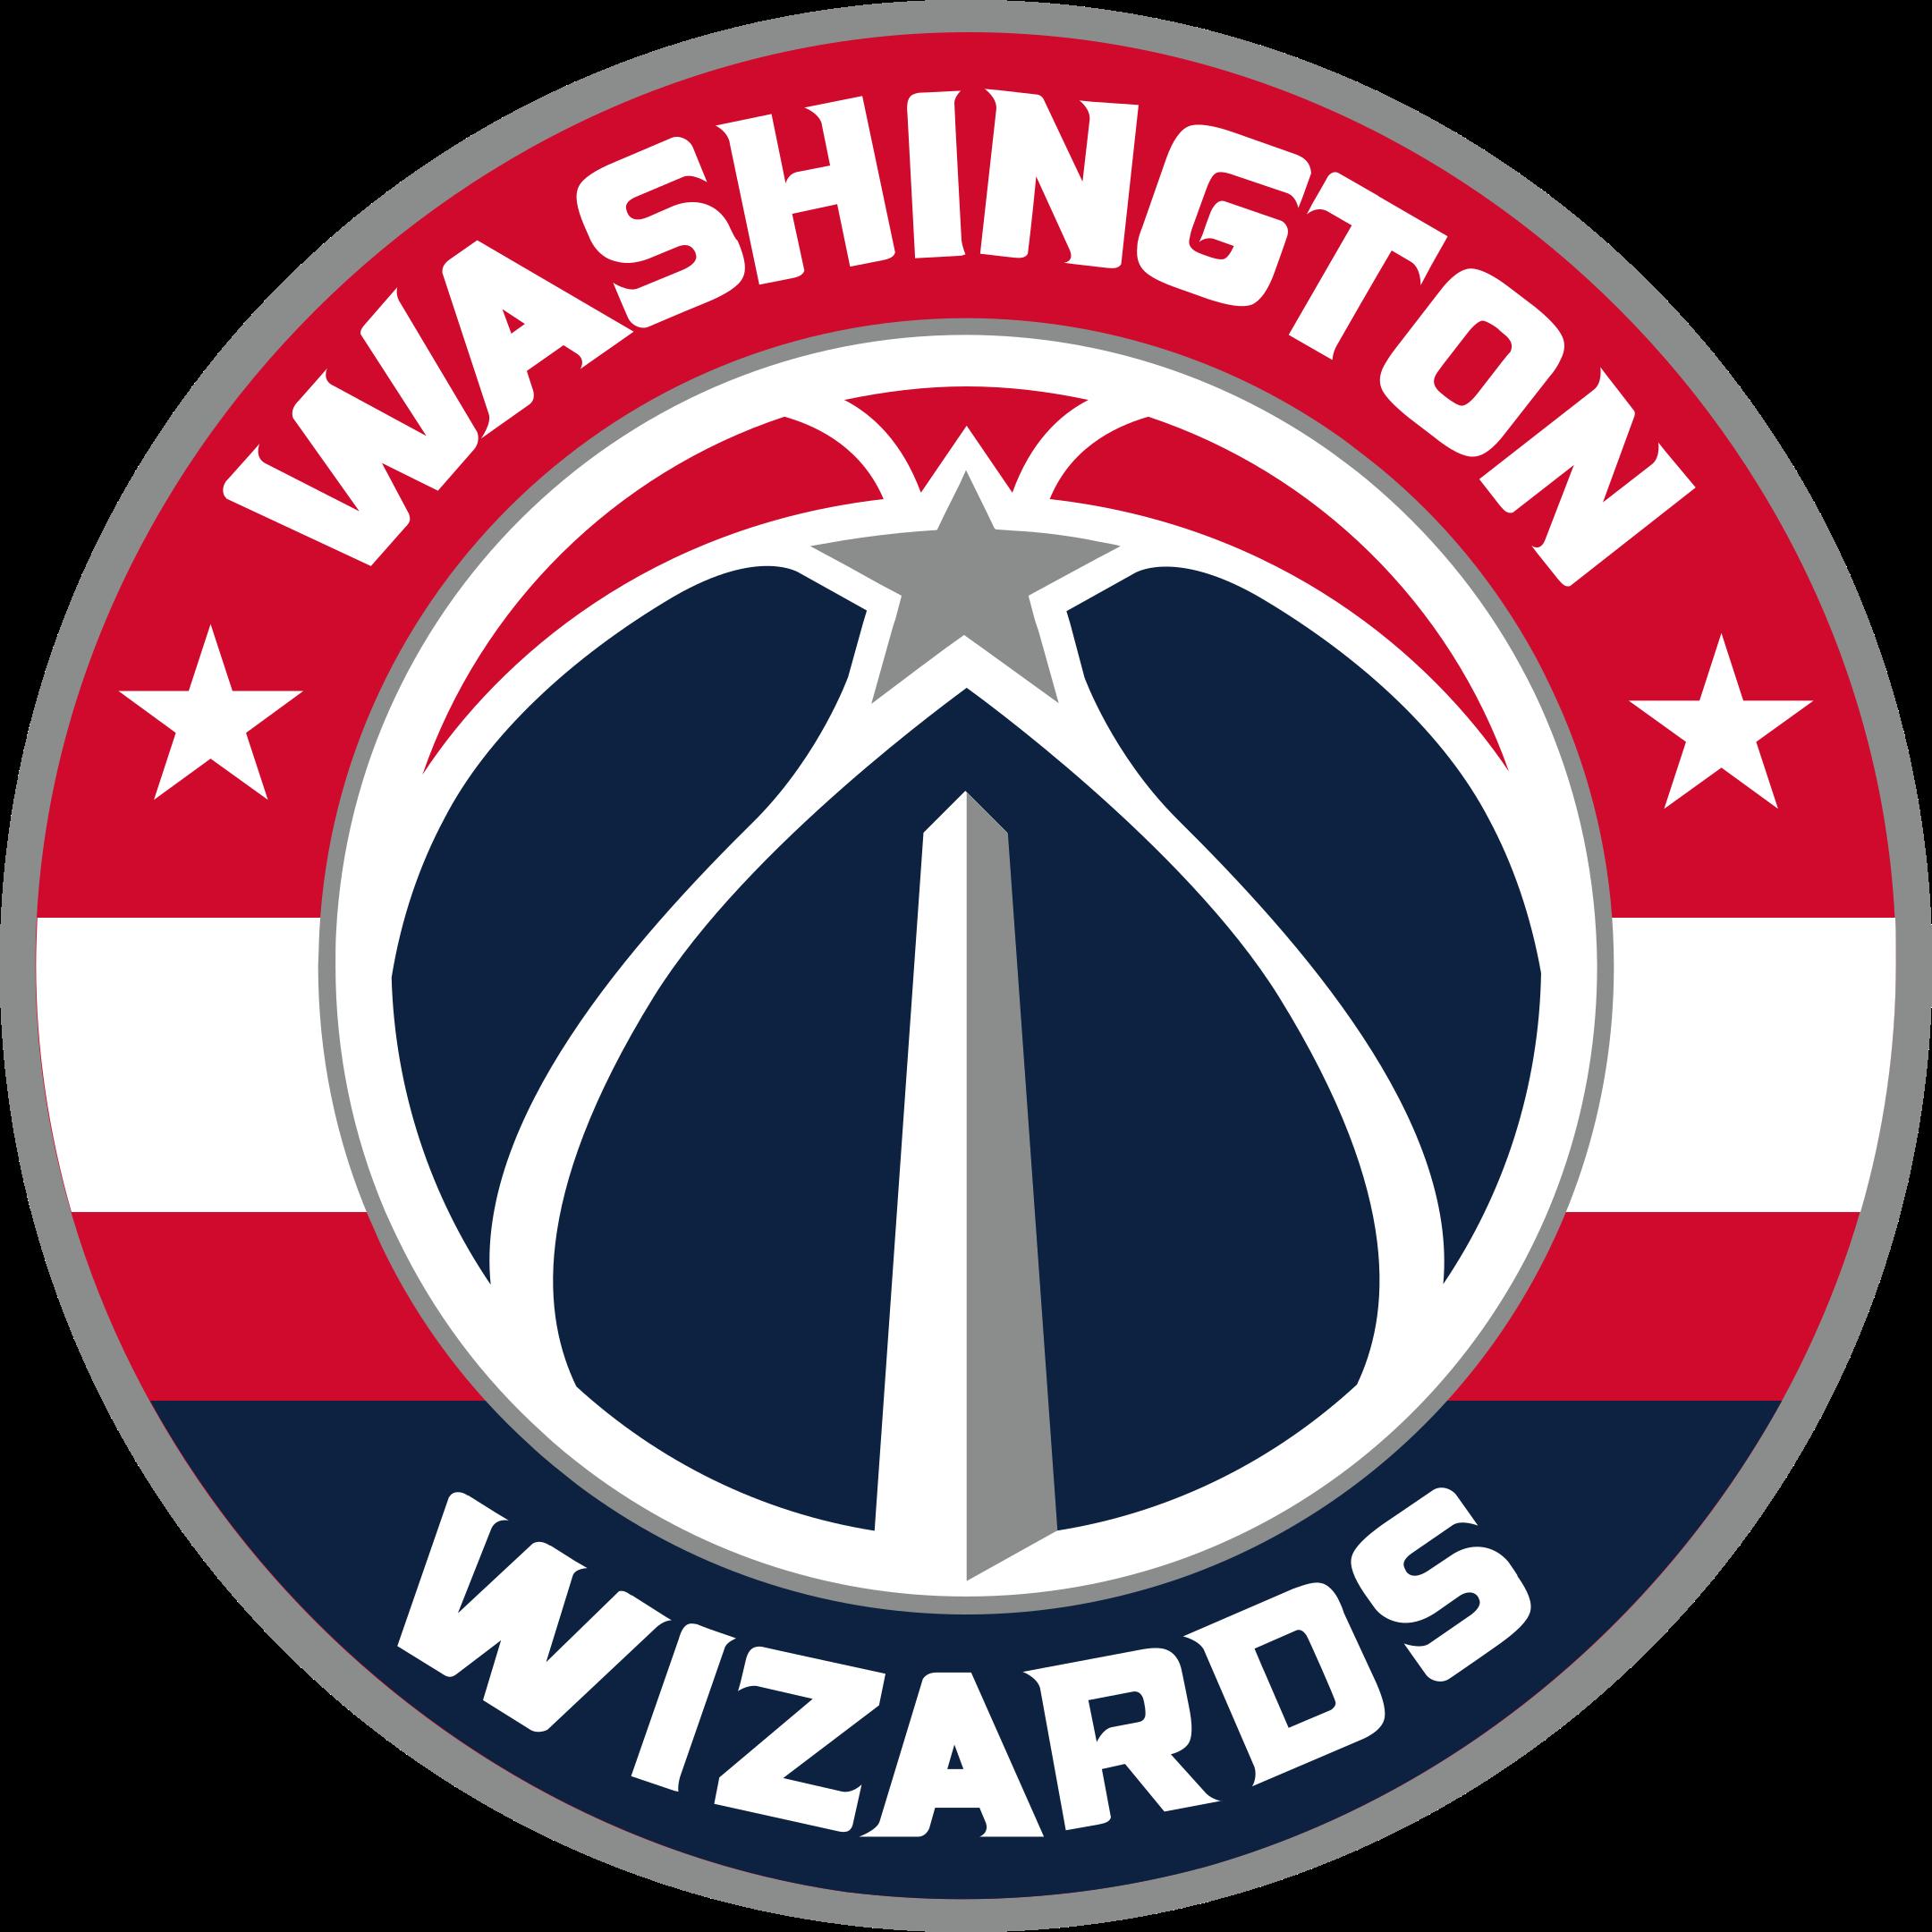 washington wizards logo 1 - Washington Wizards Logo